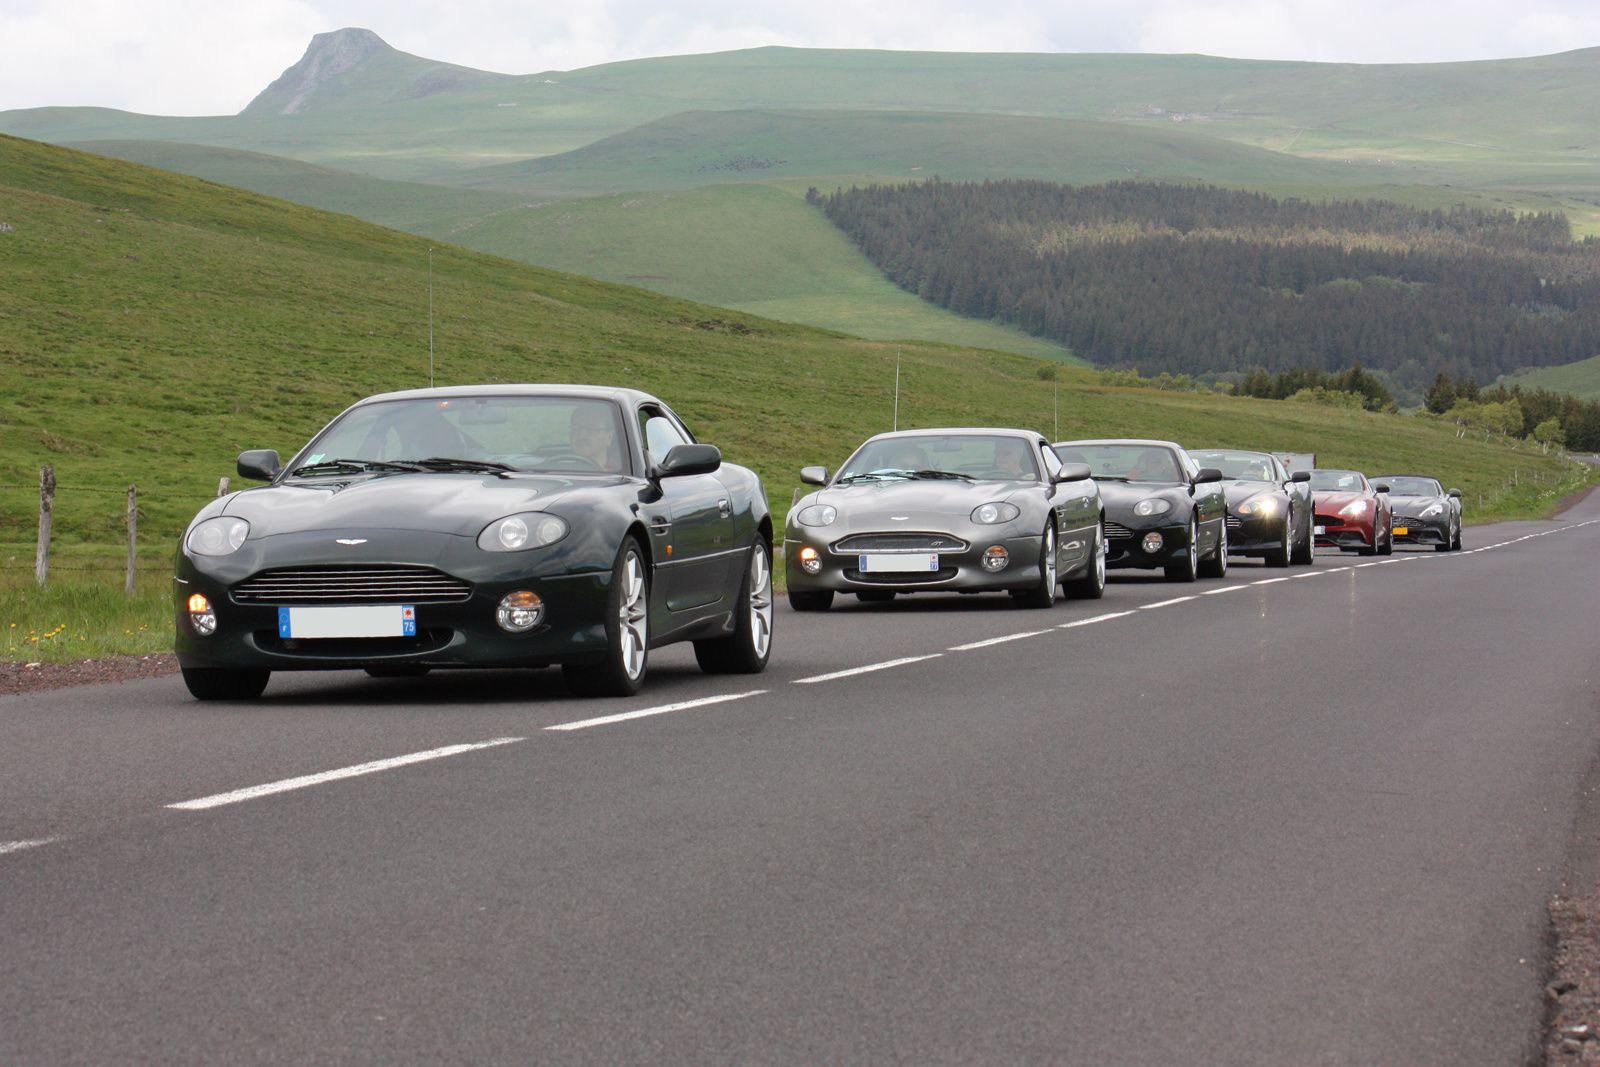 Rallye Auvergne : Le Col de la Croix Morand